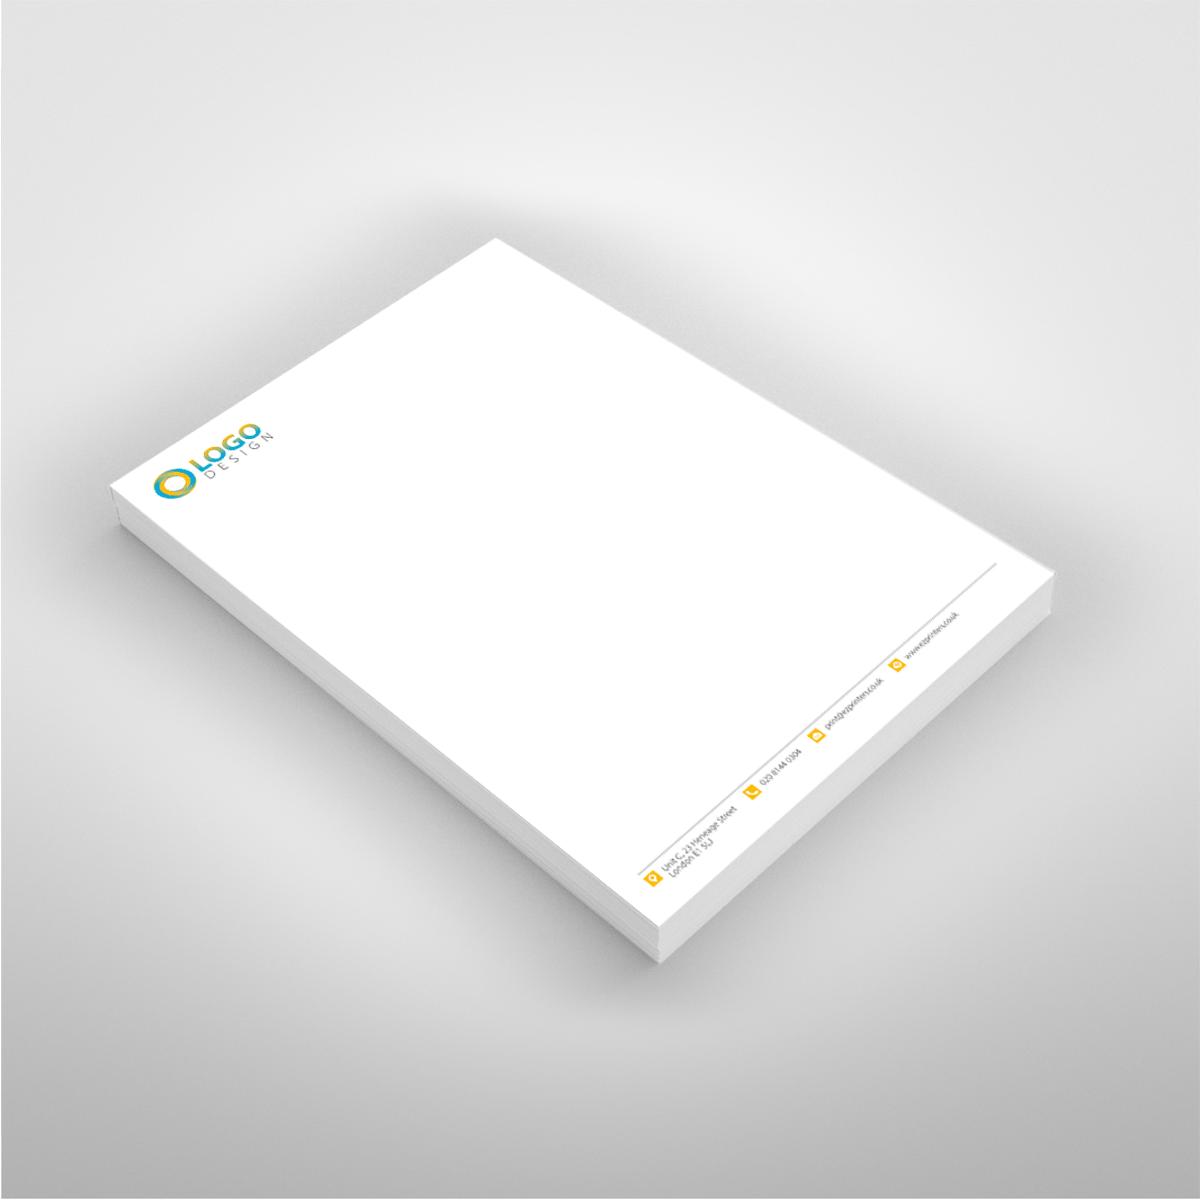 Business stationery design and printing ez printers cheaplastminuteinstant120gsmmattfinishedqualityfullcolourletterheadprintingshopeastlondonshoreditchbricklane reheart Image collections